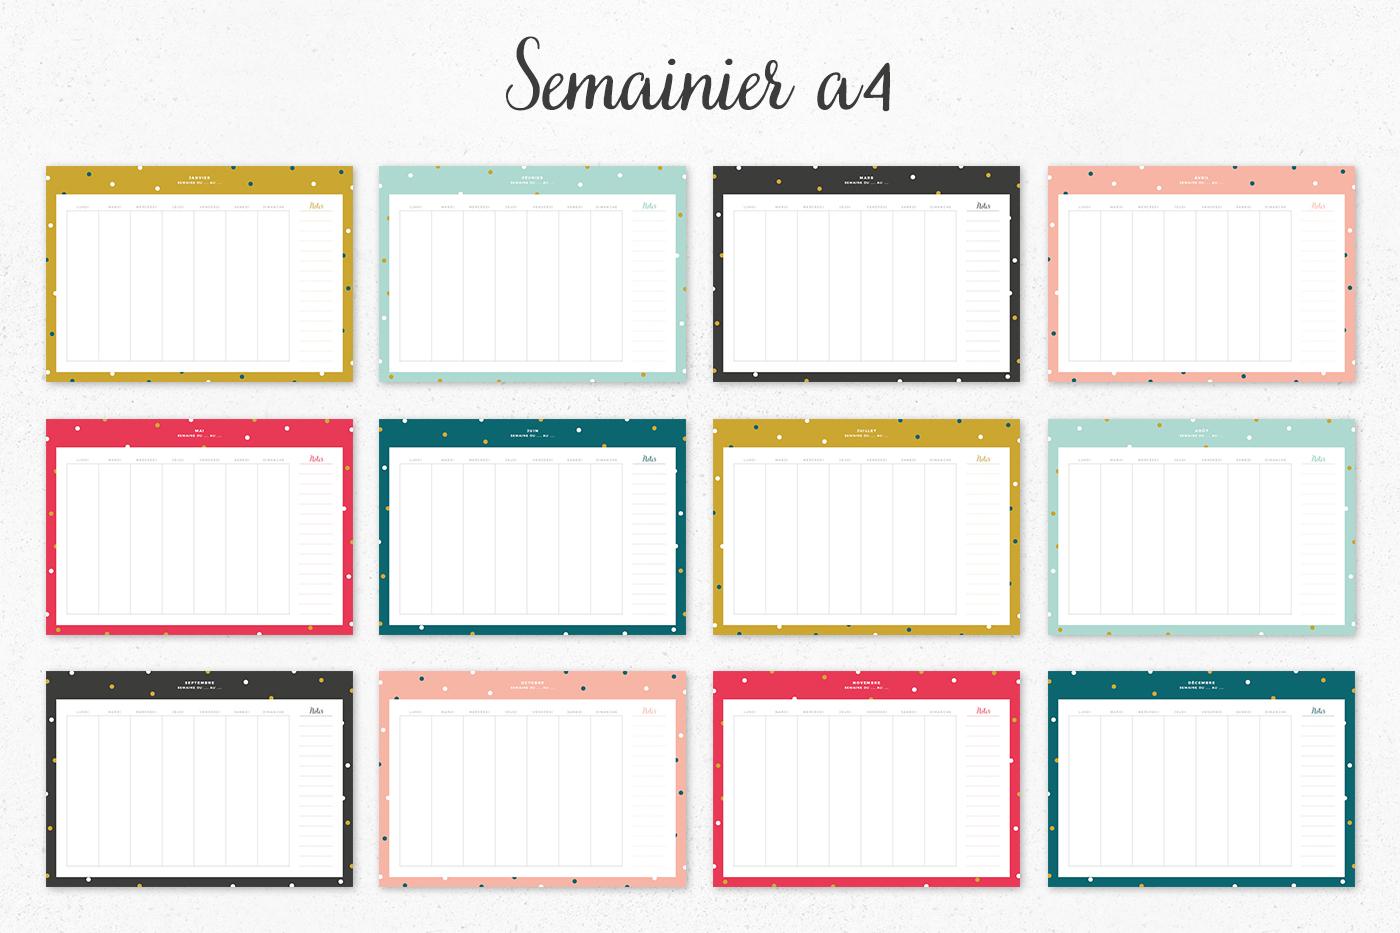 semainier a4 à imprimer Juliette blog féminin